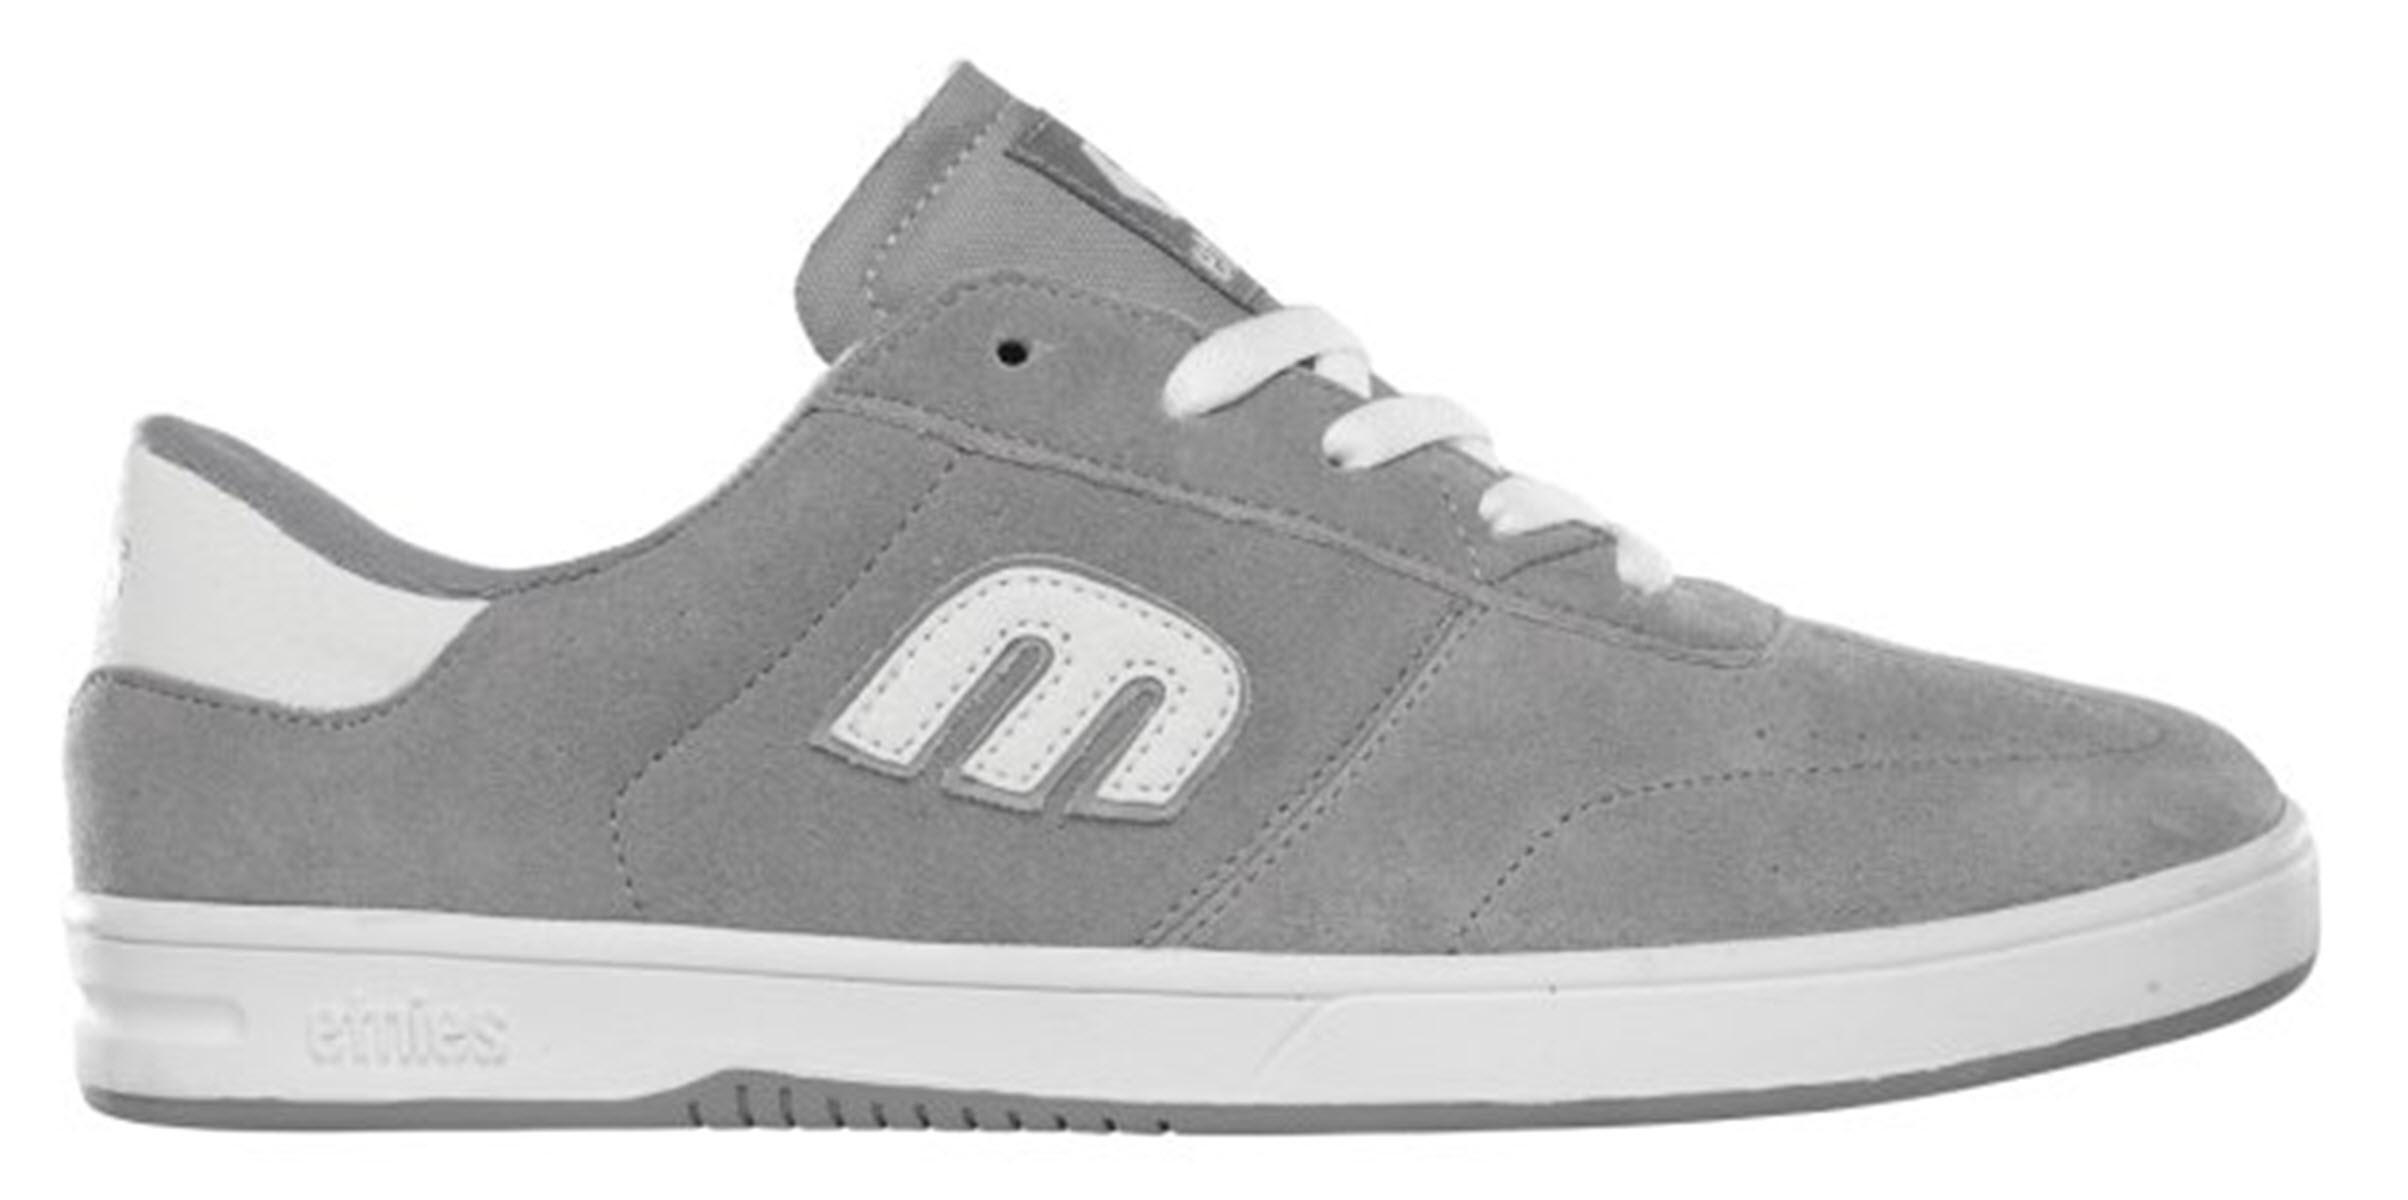 Etnies-Lo-Cut-Skate-Shoes-2015-Grey-White-